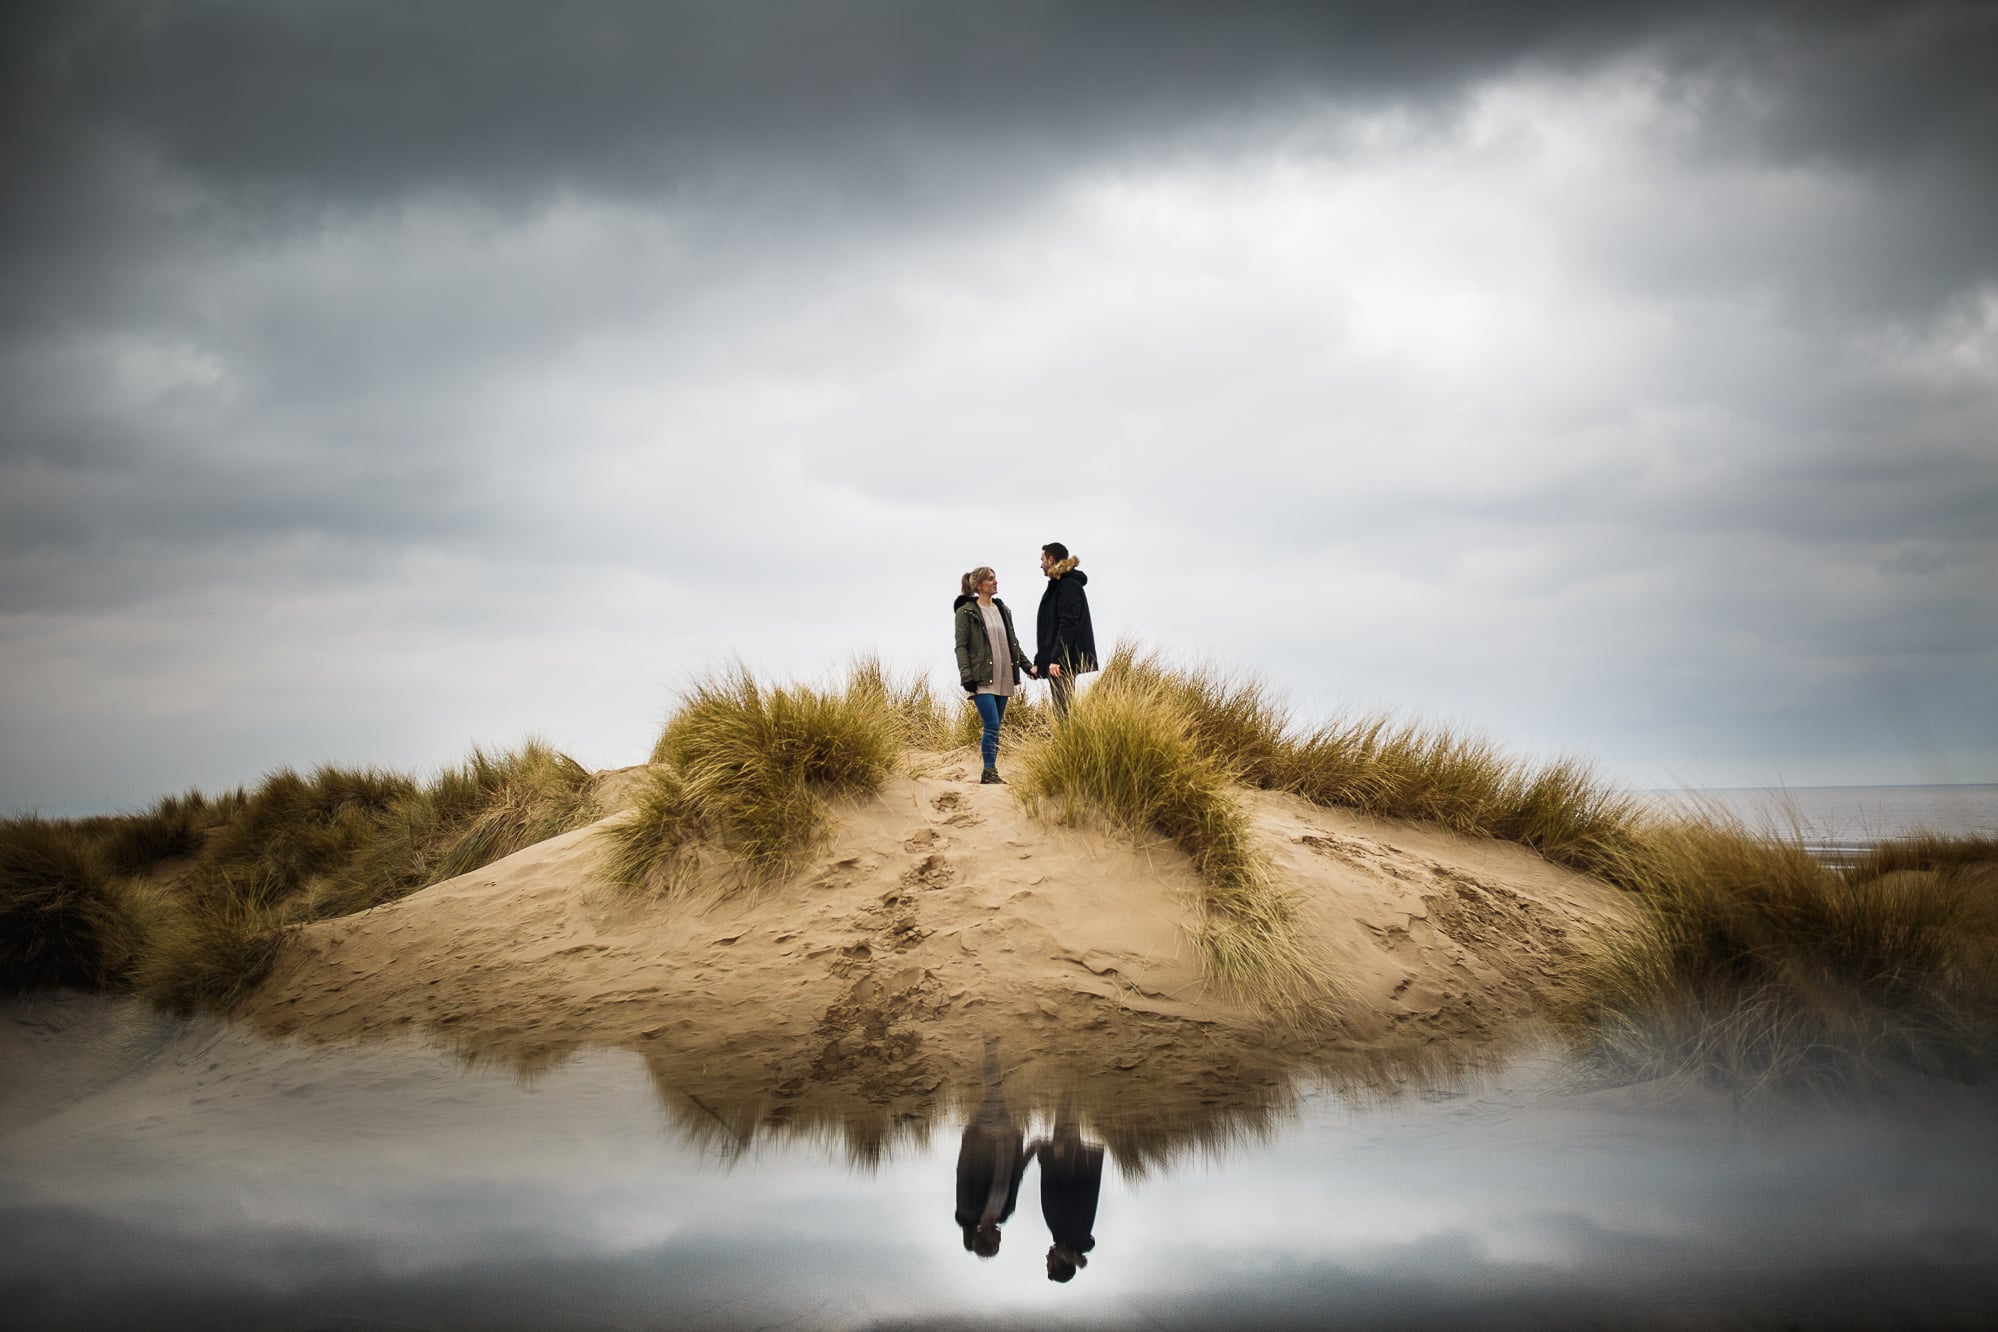 sanddunes reflection